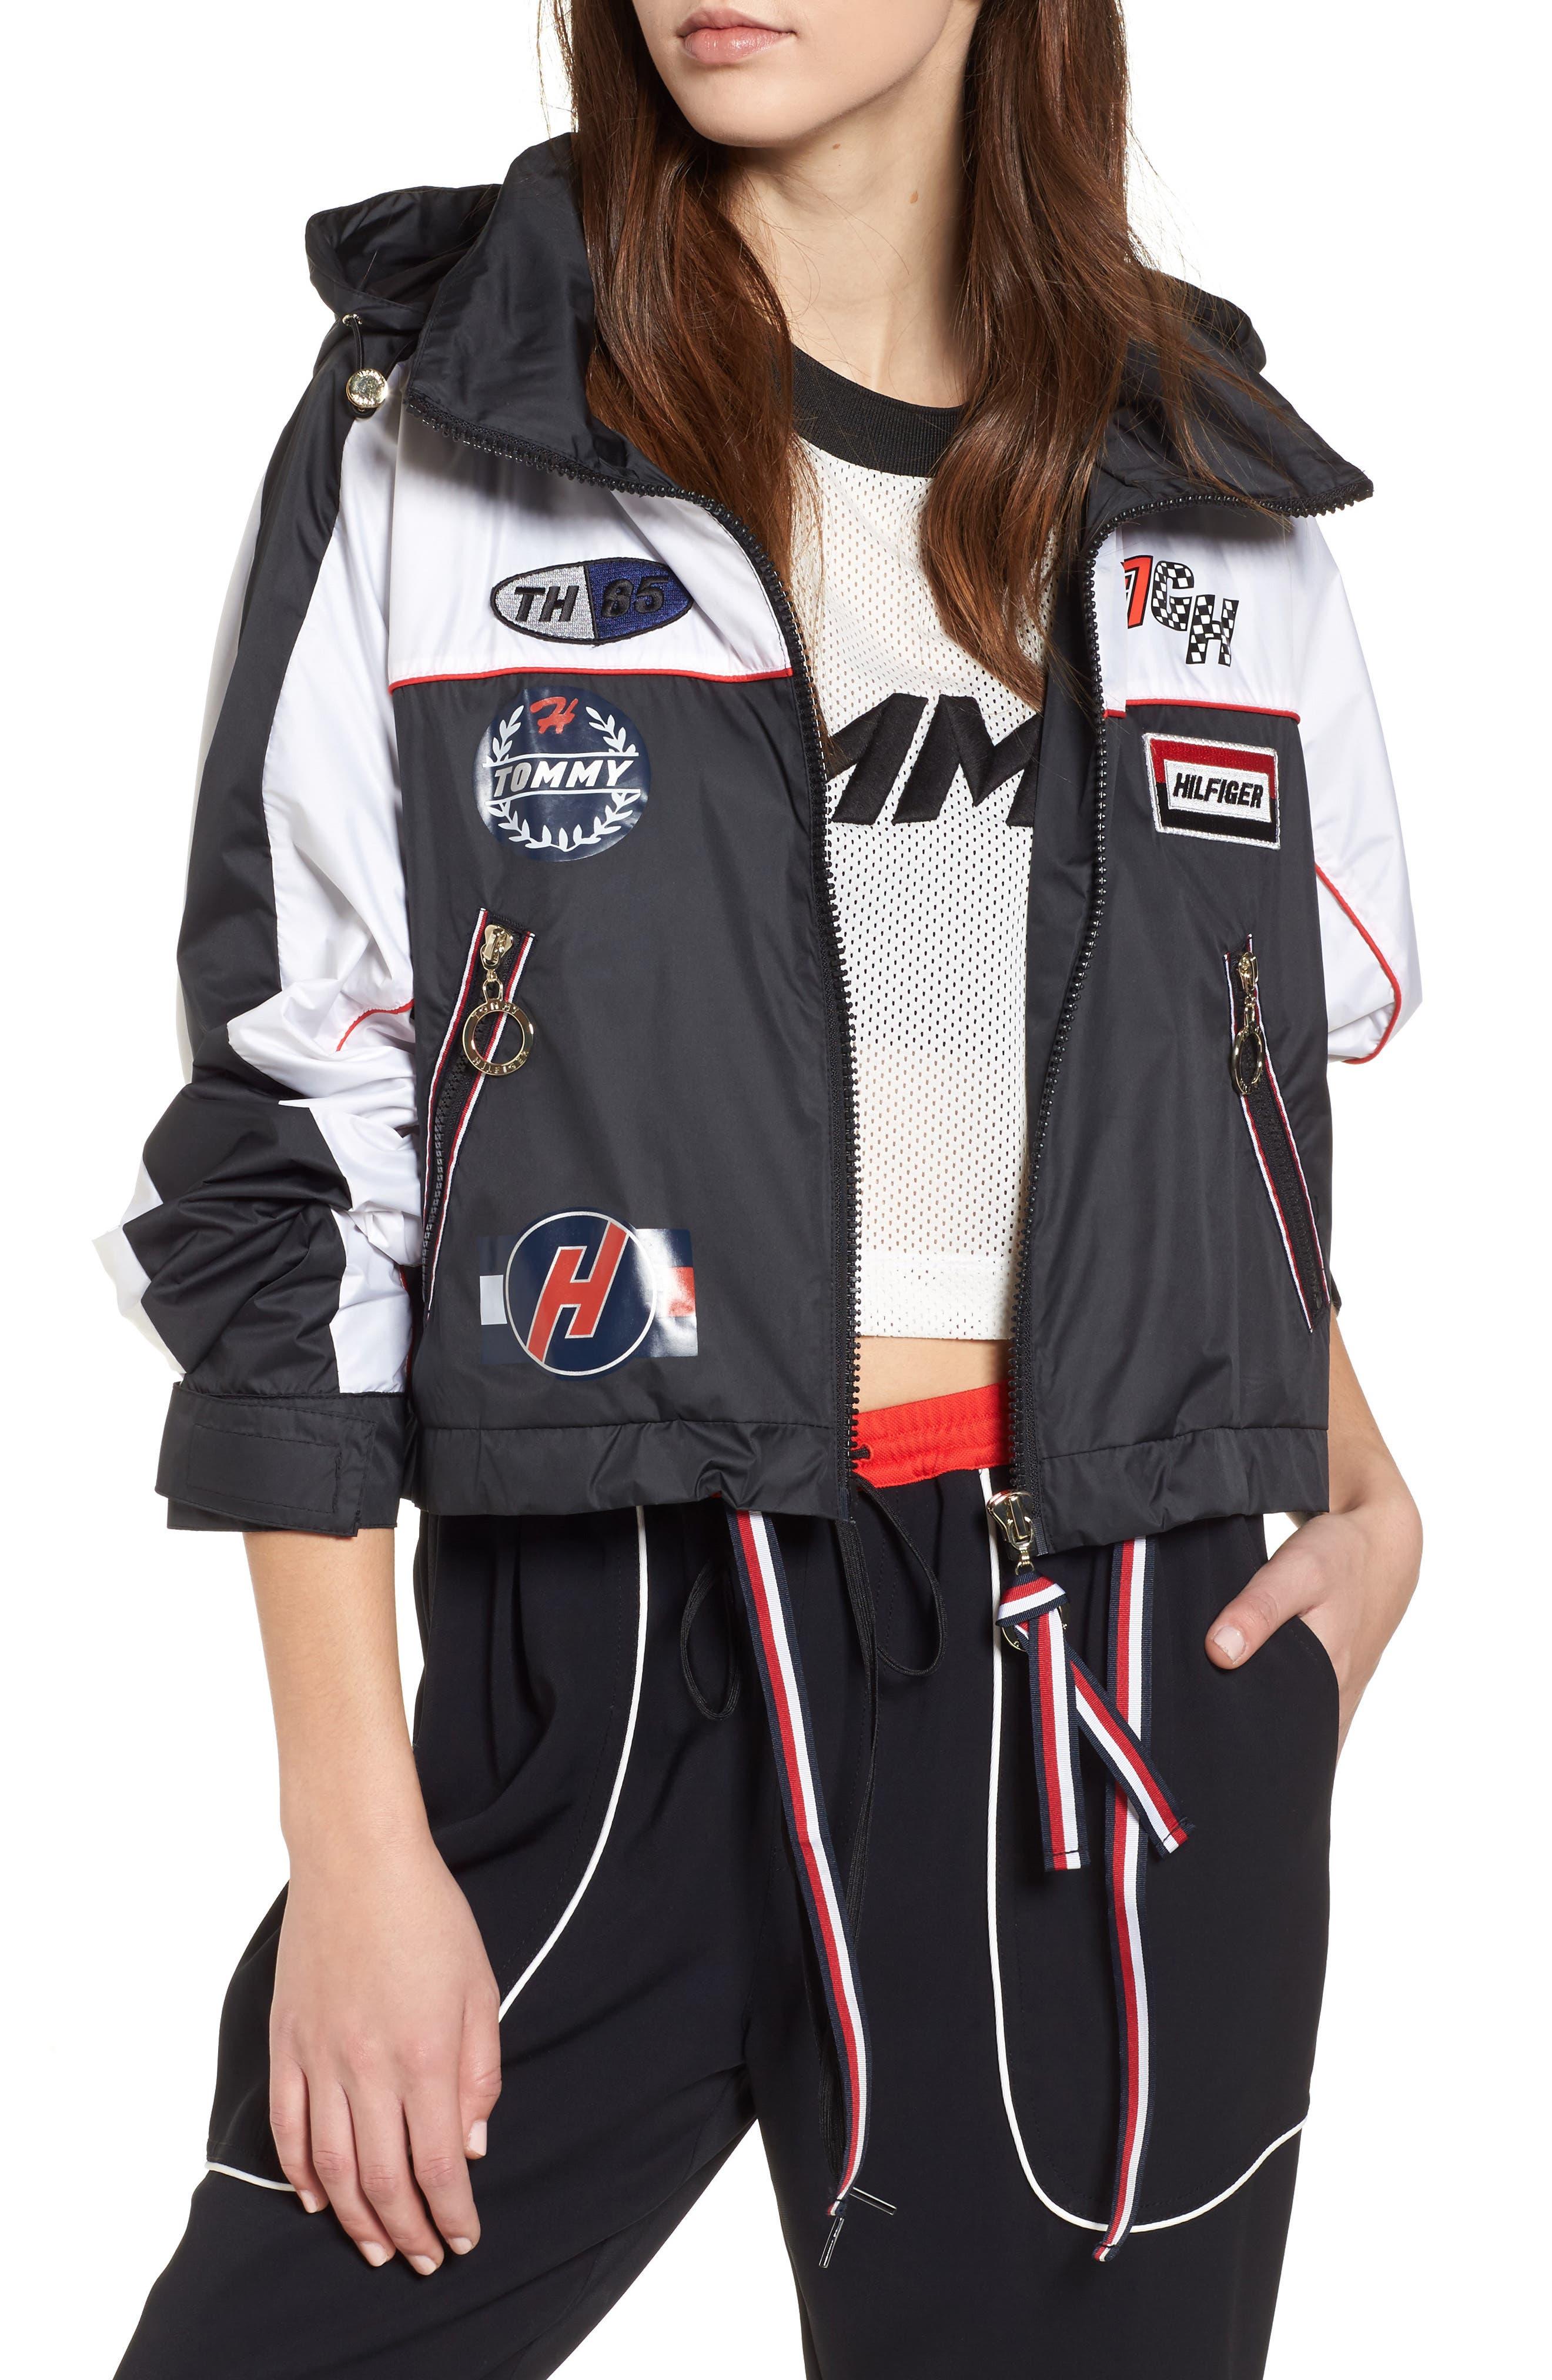 TOMMY JEANS x Gigi Hadid Windbreaker Jacket